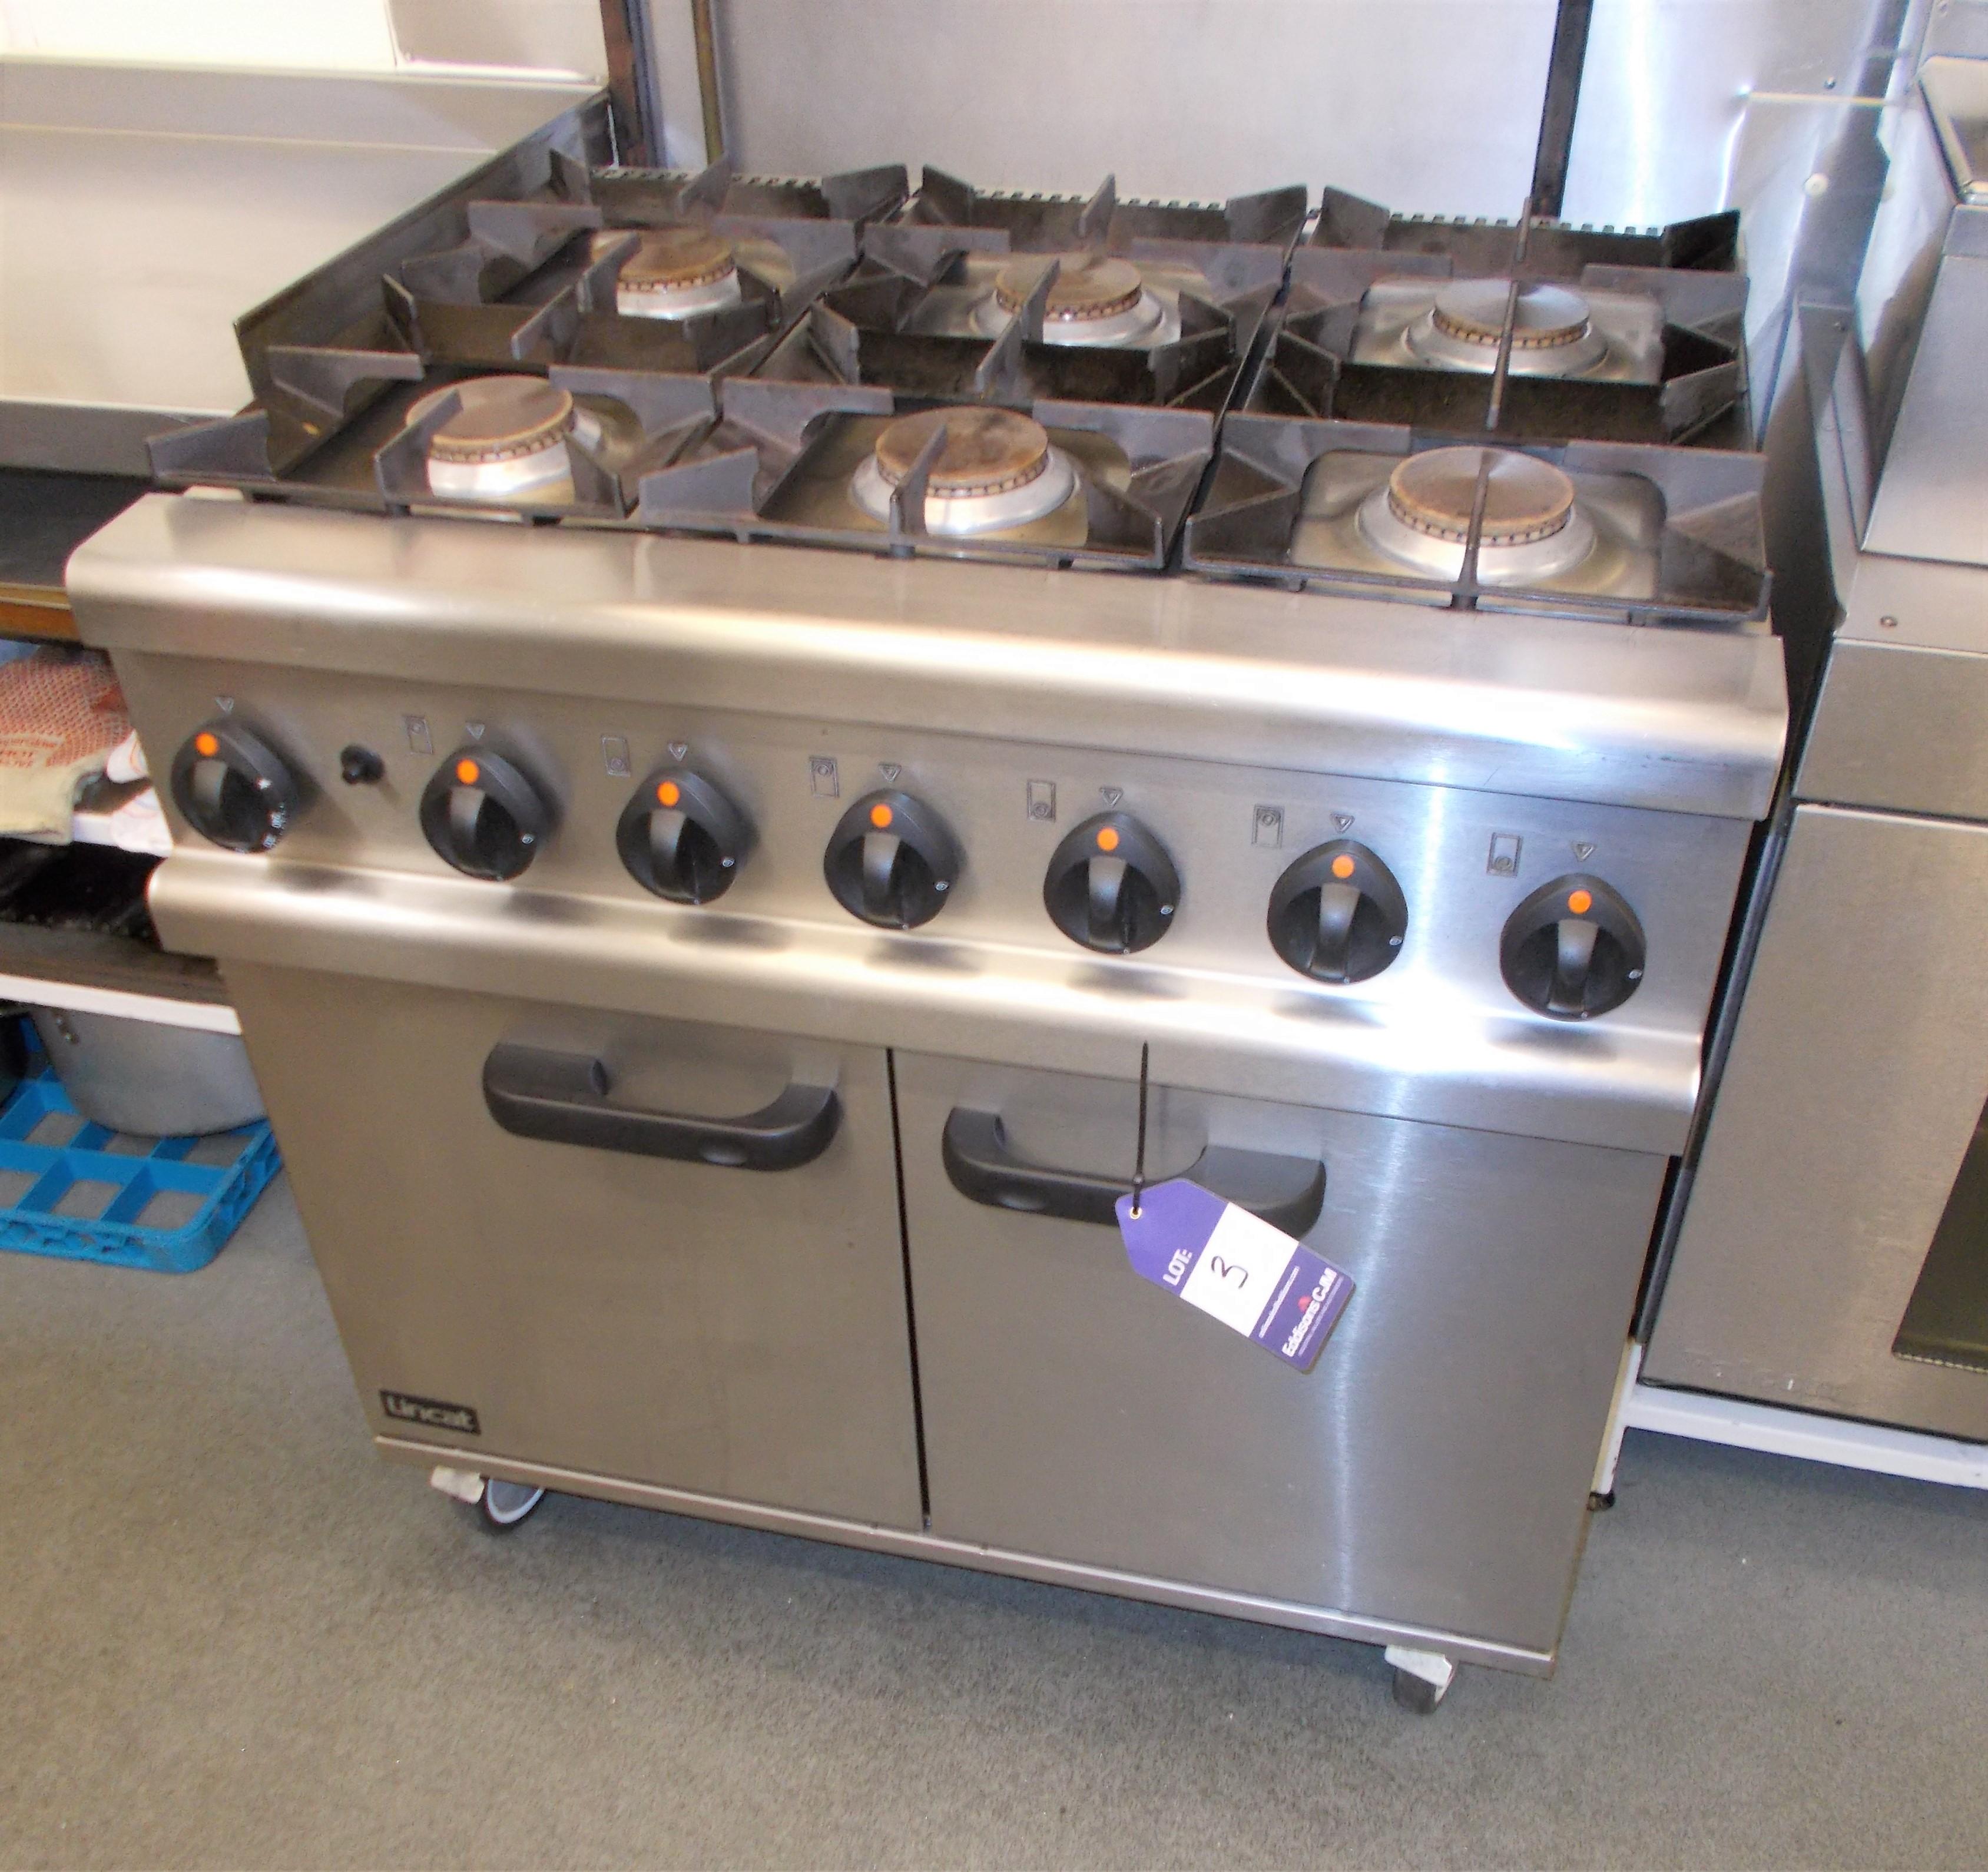 Lincat 6 hob double door mobile gas oven. Dimensions: W: 3ft x D: 2ft 5 x H: 3ft *Please note, it is